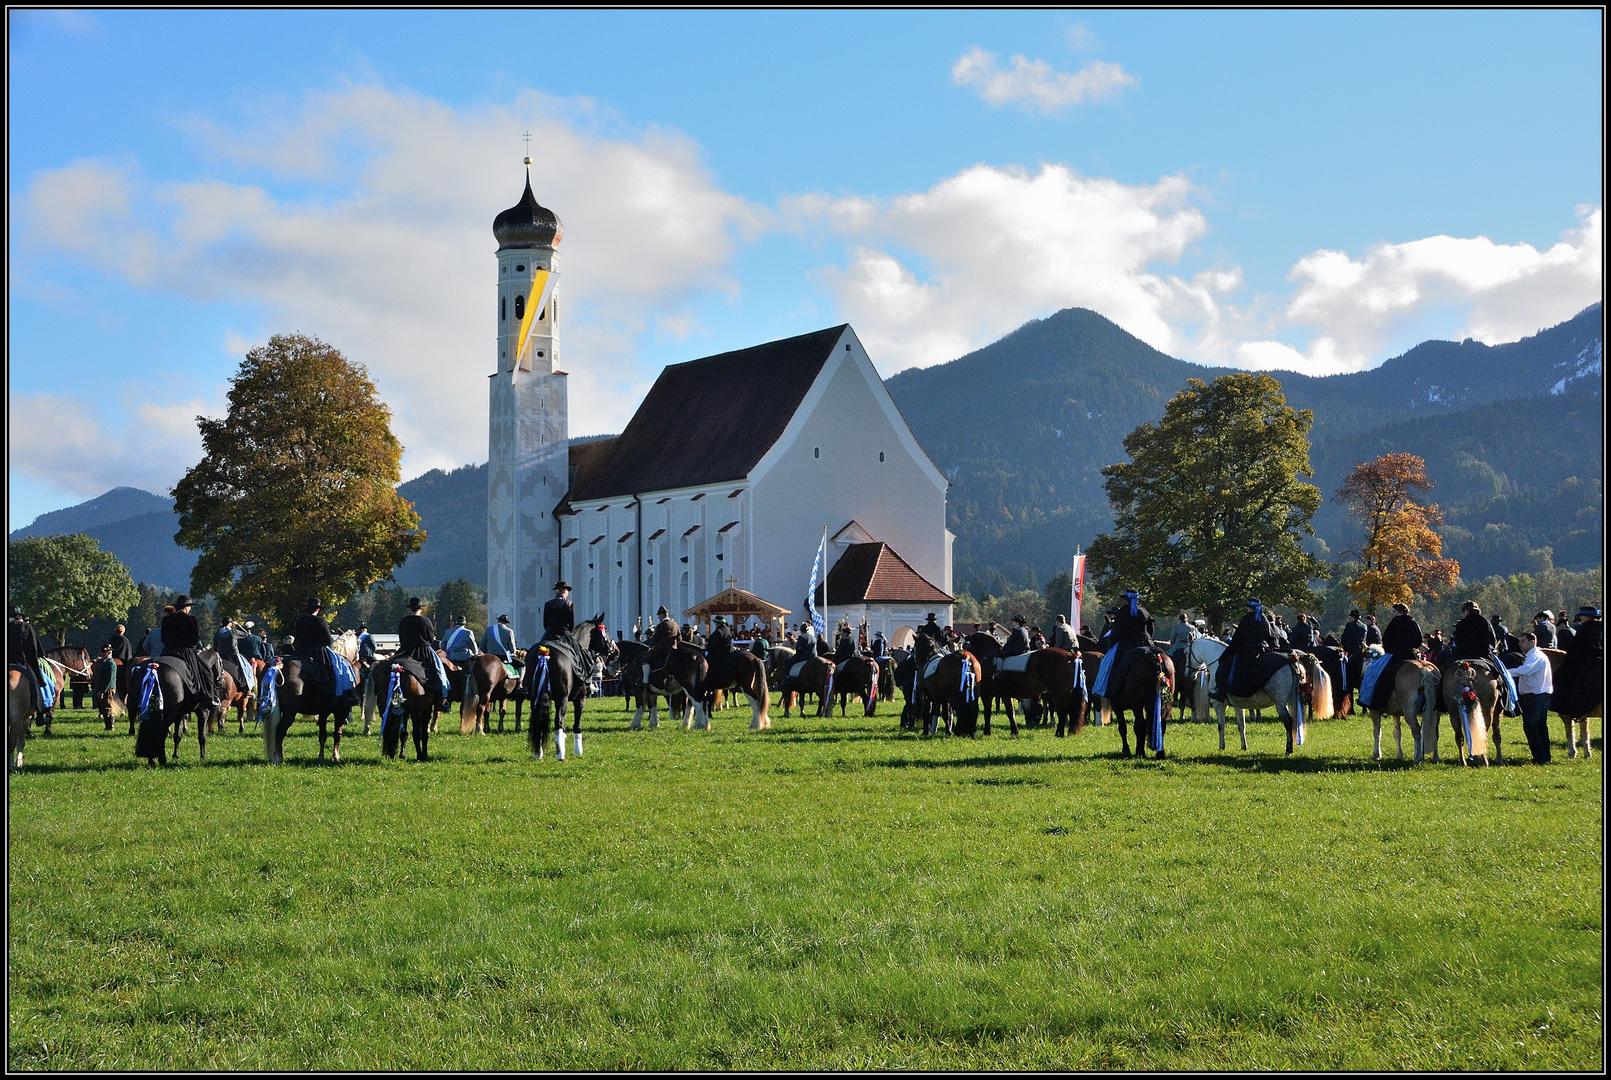 St. Colomansritt in Schwangau am 13.10.2013 (03)